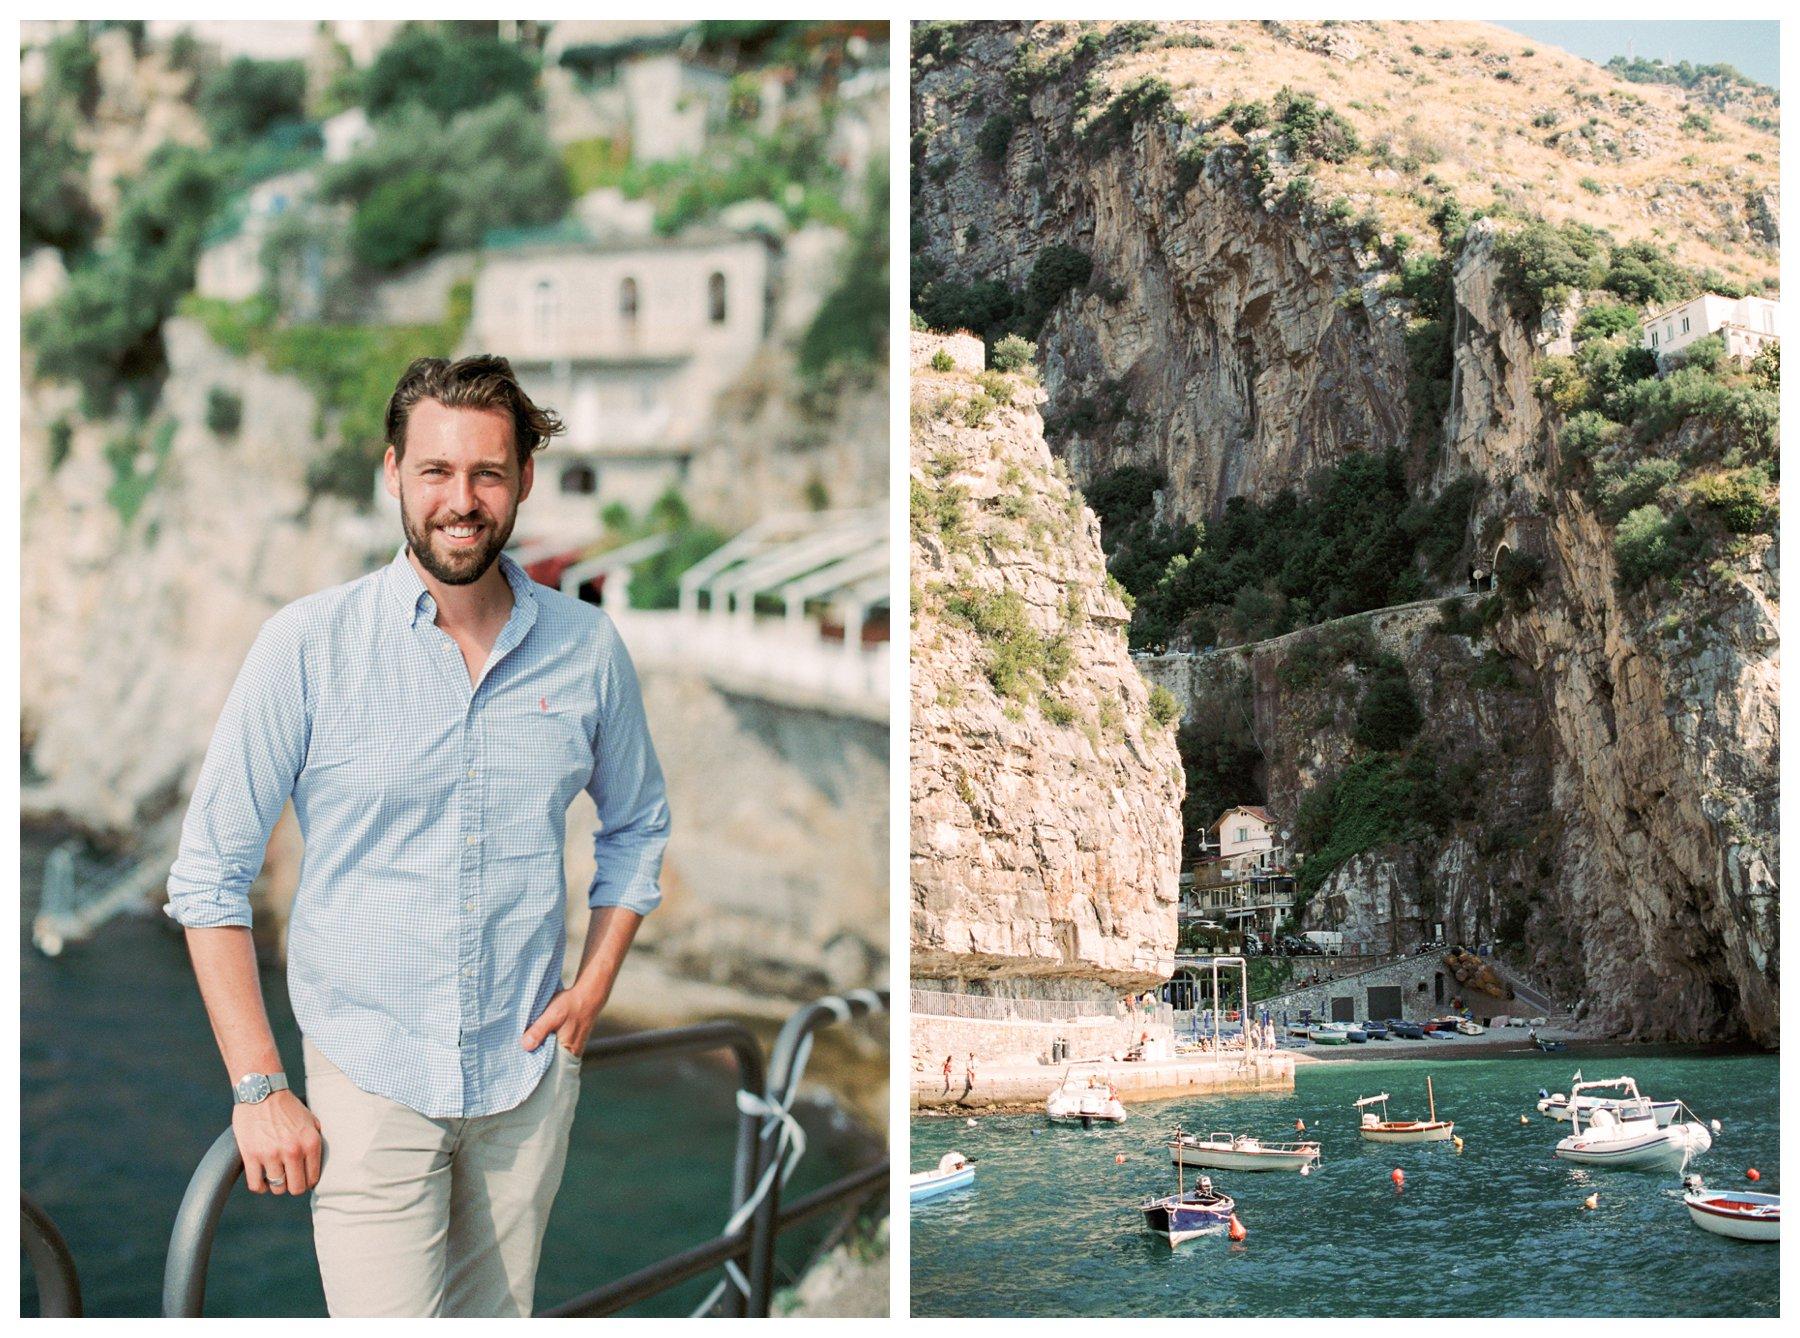 fine art travel photography of Priano, Amalfi Coast